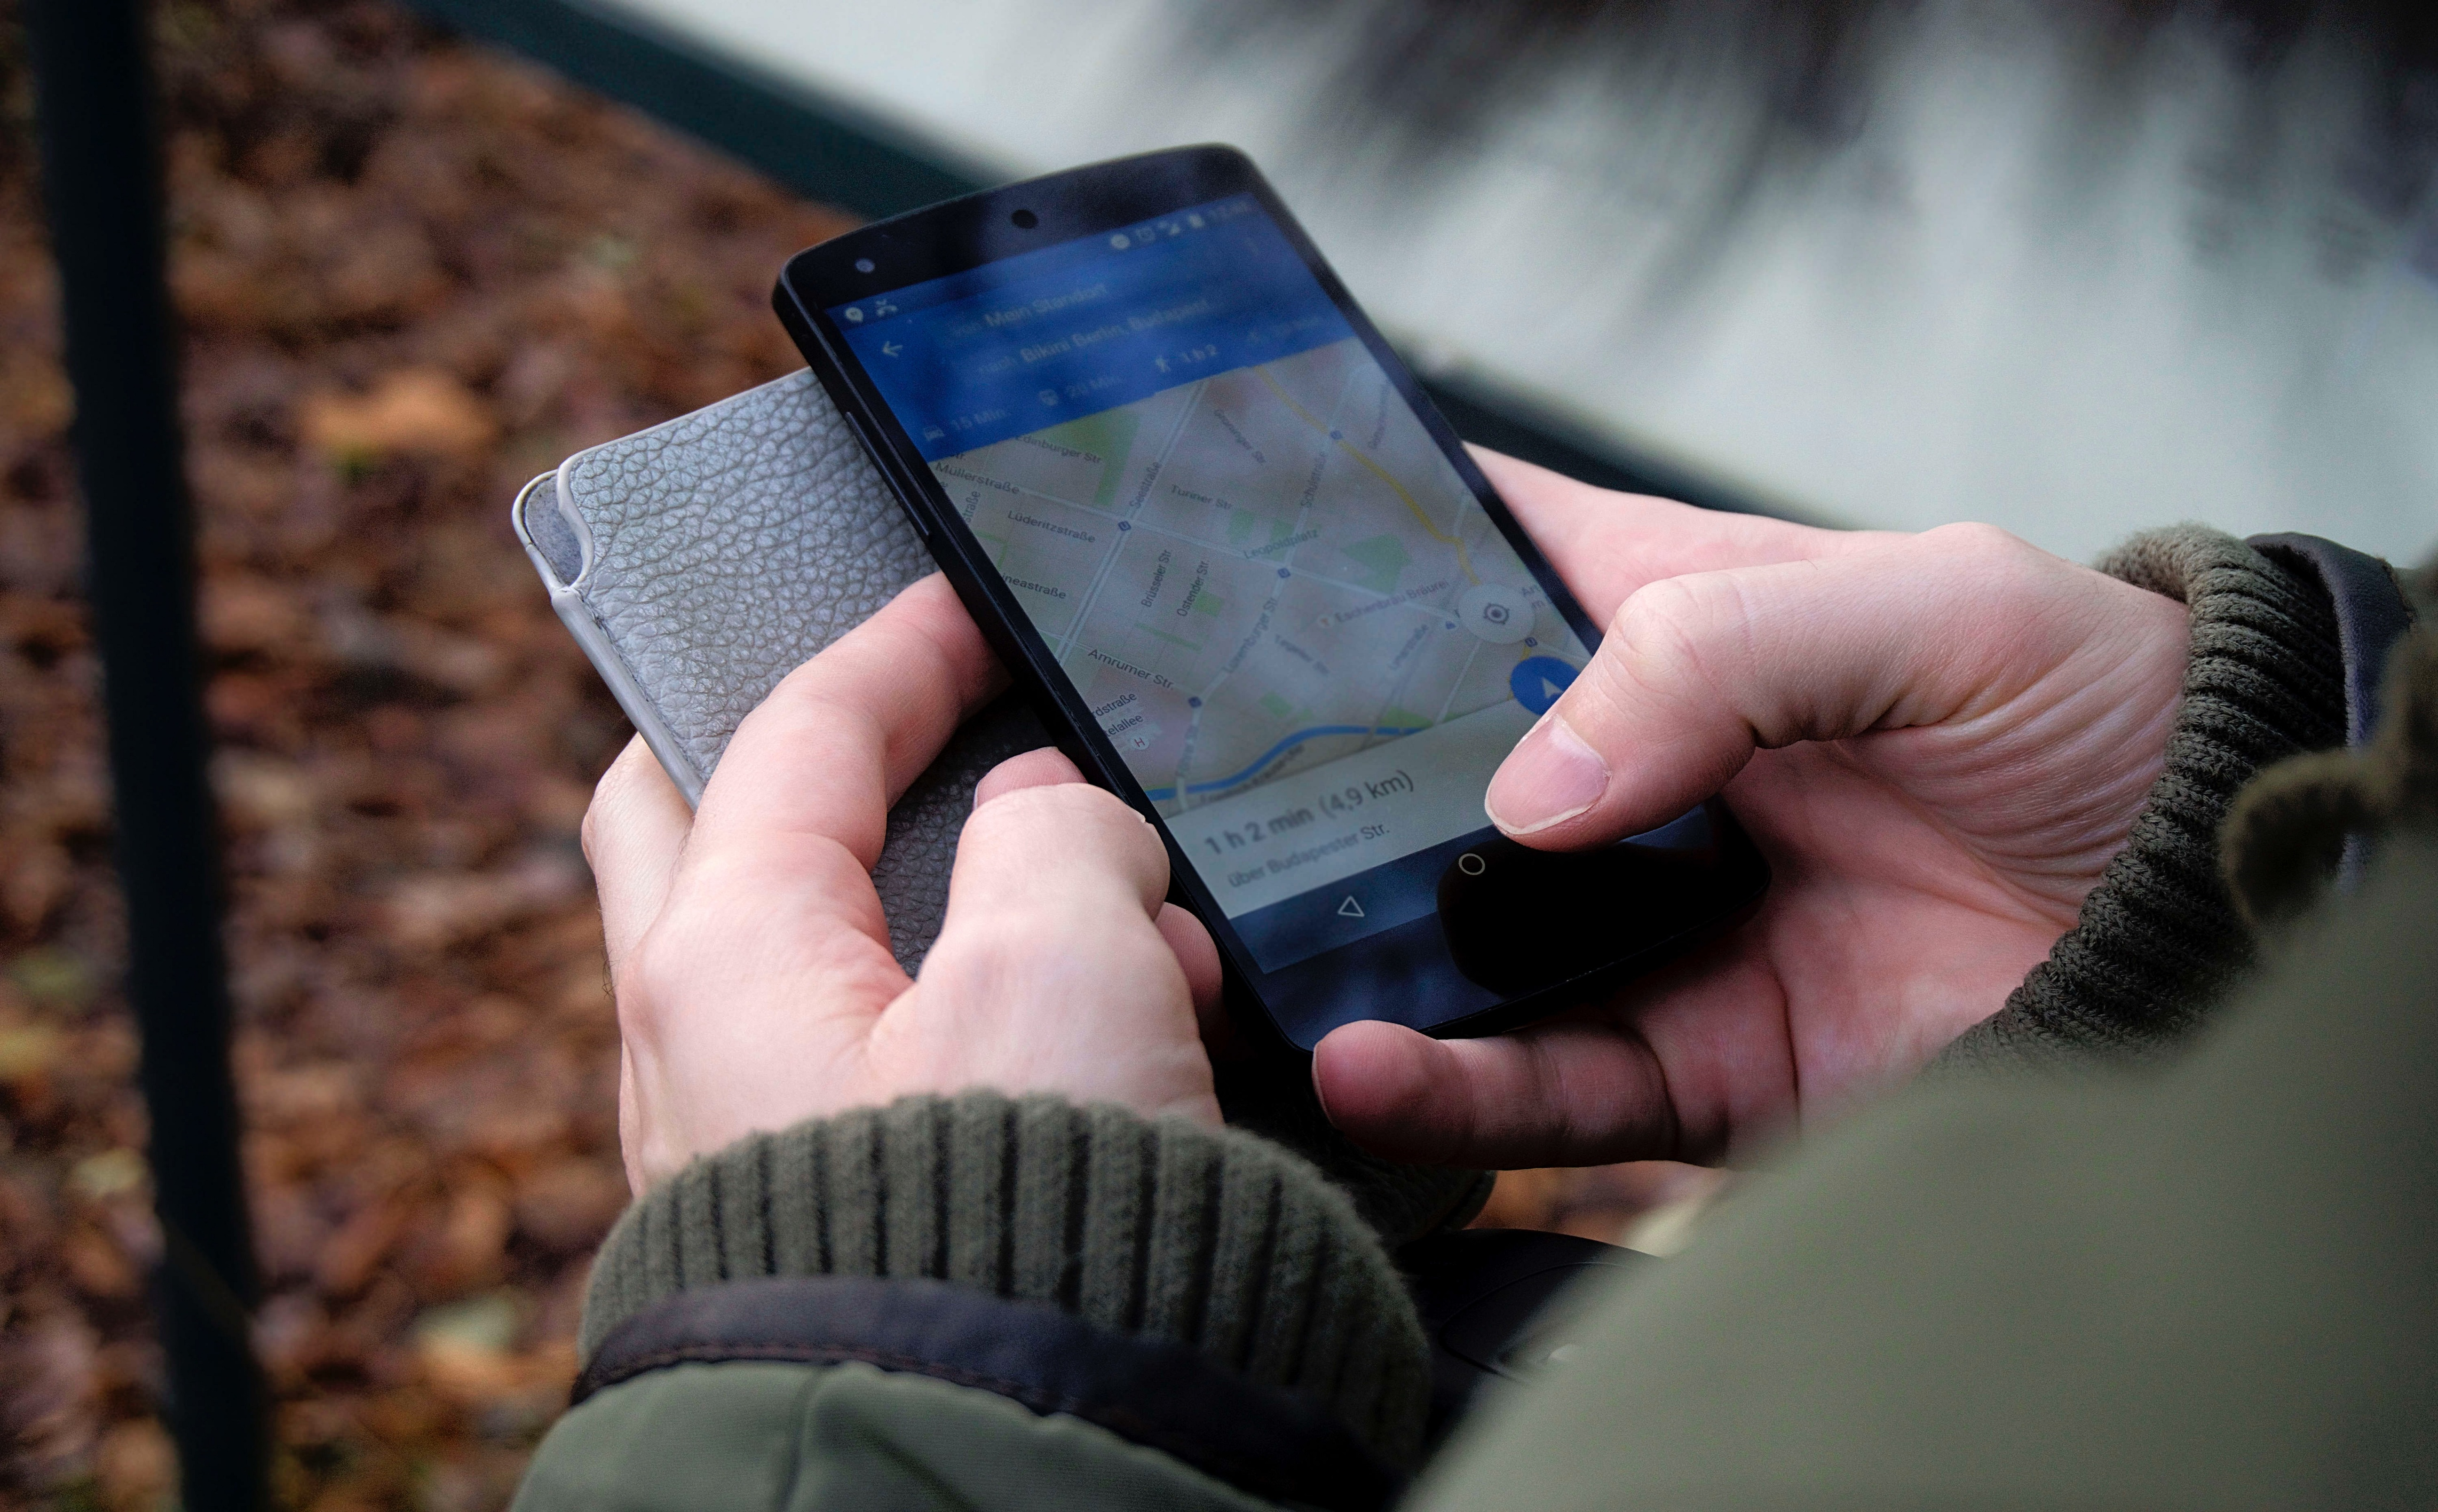 Hyperlocal optimization - Google maps on mobile phone